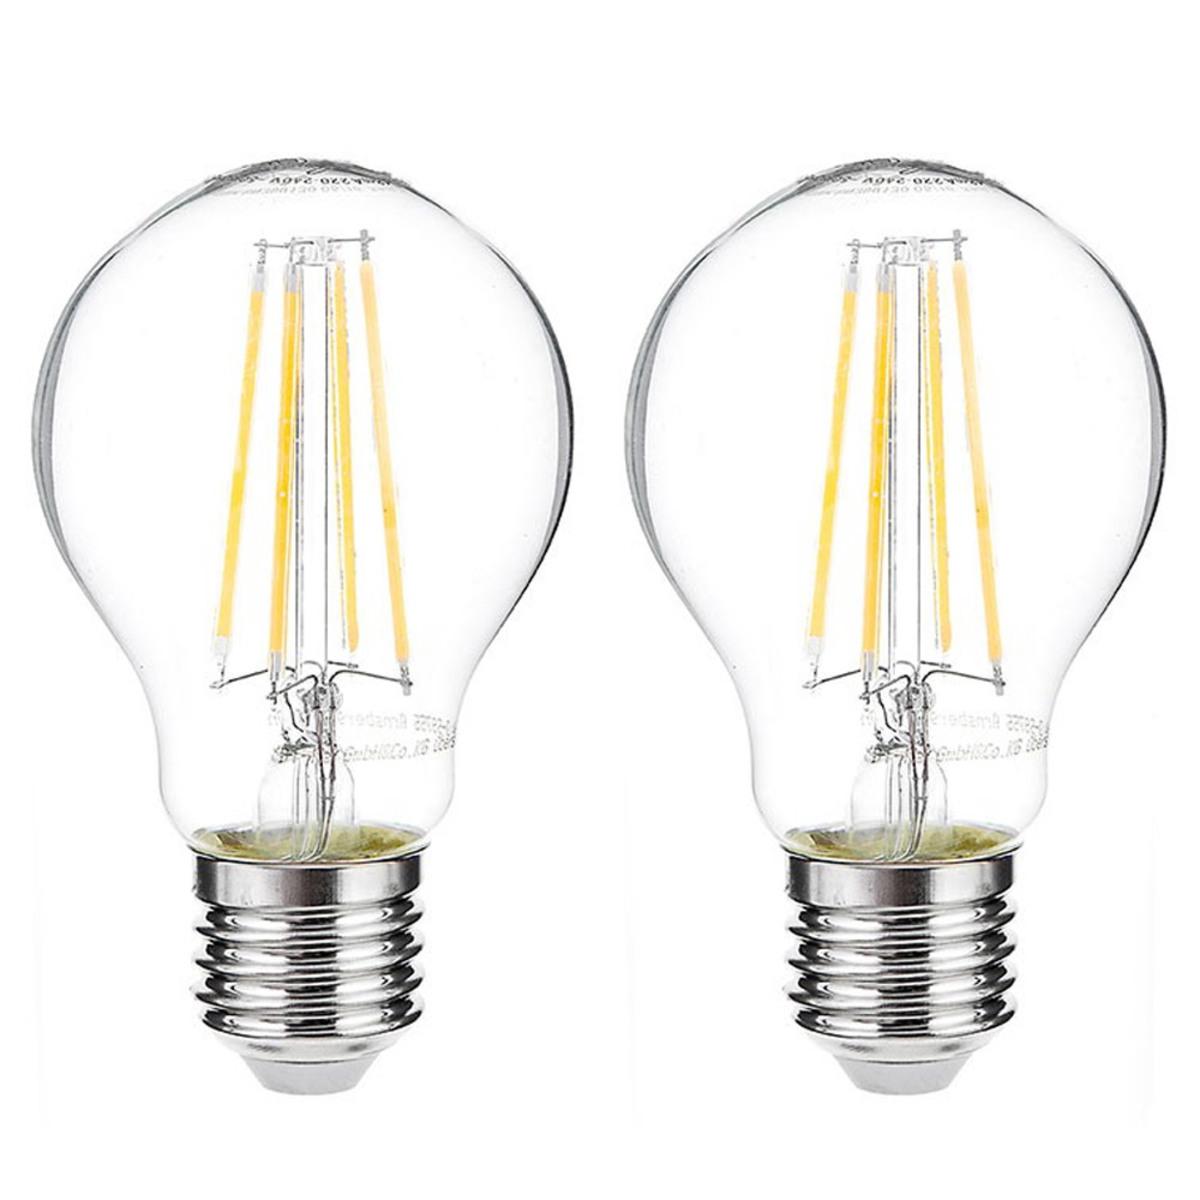 Bild 1 von I-Glow LED-Leuchtmittel Filament 360° - Birne, 7 Watt, E27, klar 2er Set